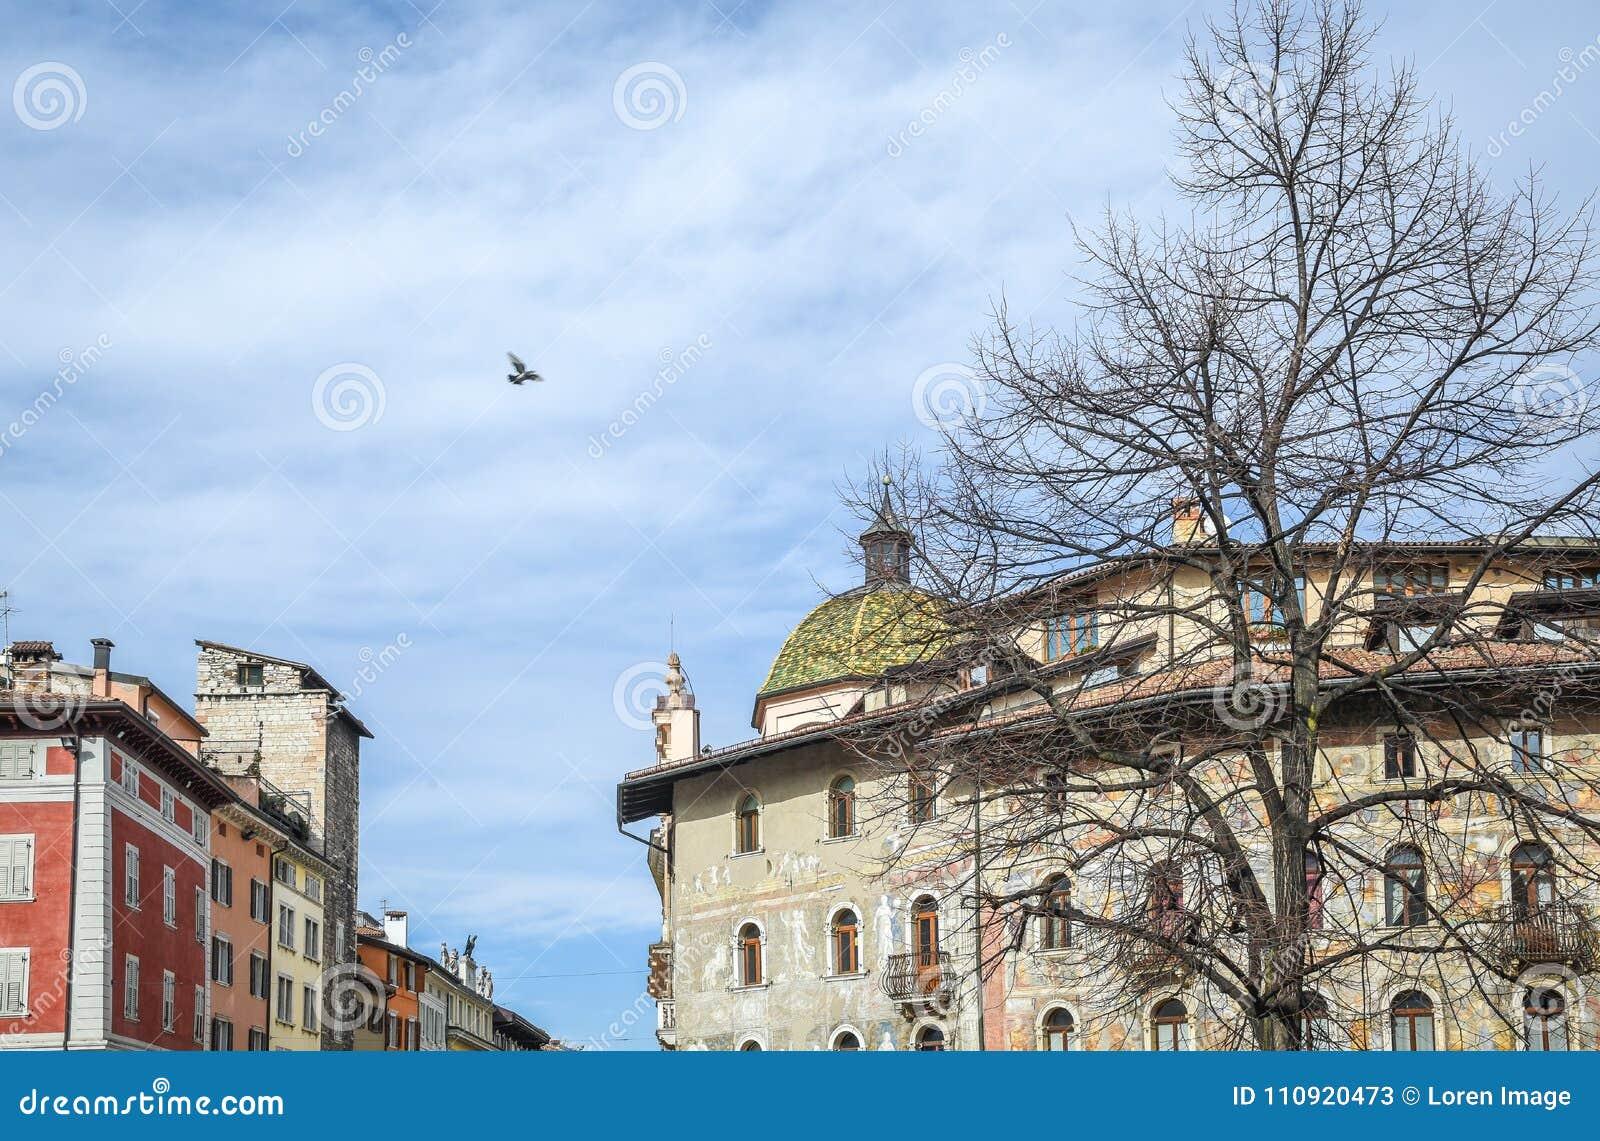 Frescoes på de Cazuffi-Rella husen i Duomo kvadrerar Trento Trentino Alto Adige, Italien